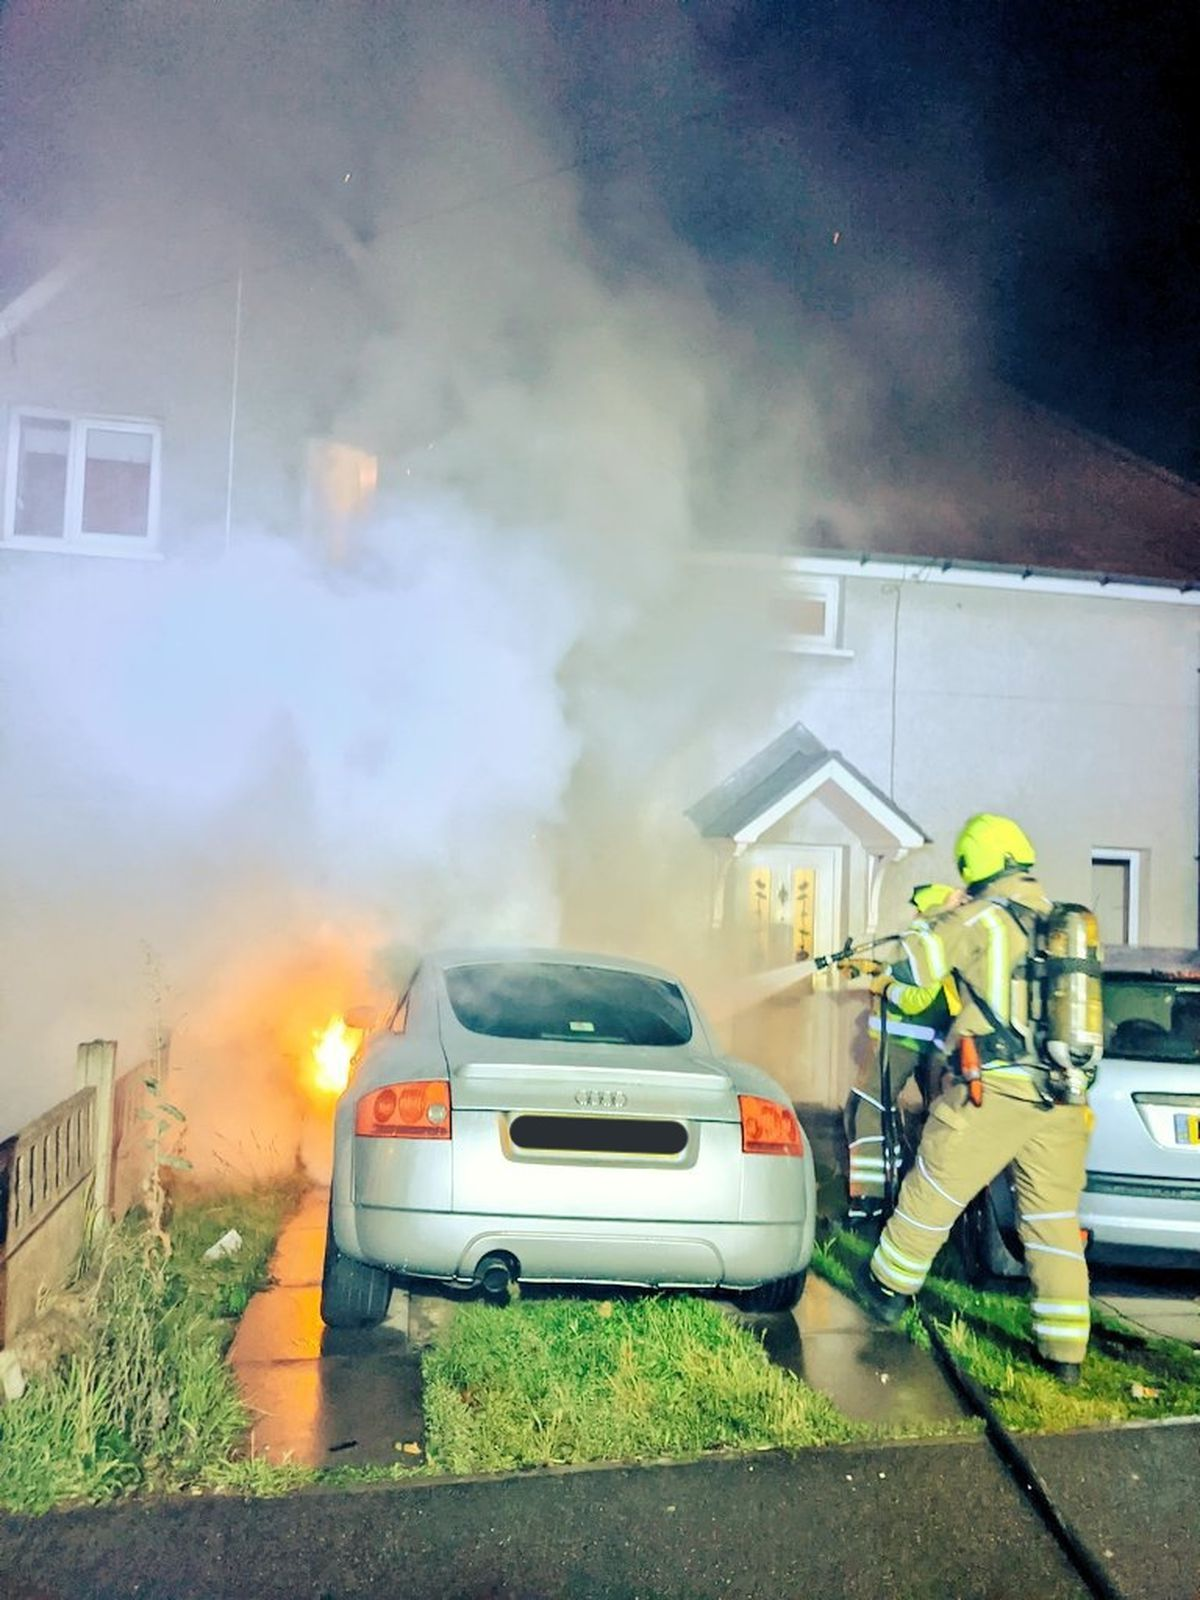 Firefighters at the scene. Photo: Aldridge Fire